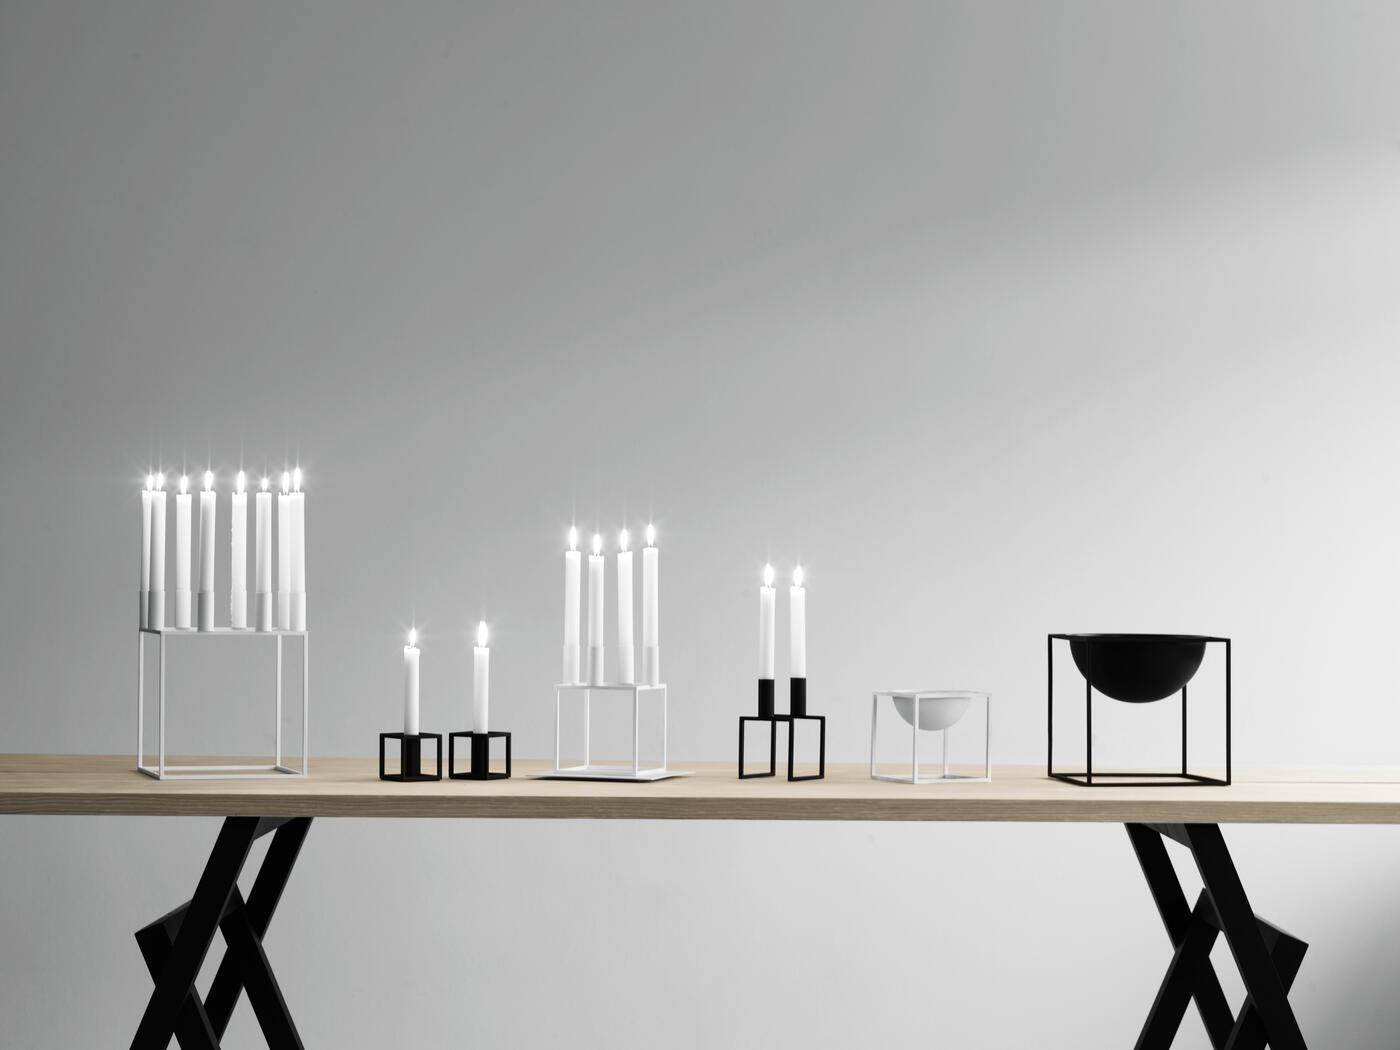 kubus ljusstake fr n by lassen olsson gerthel. Black Bedroom Furniture Sets. Home Design Ideas